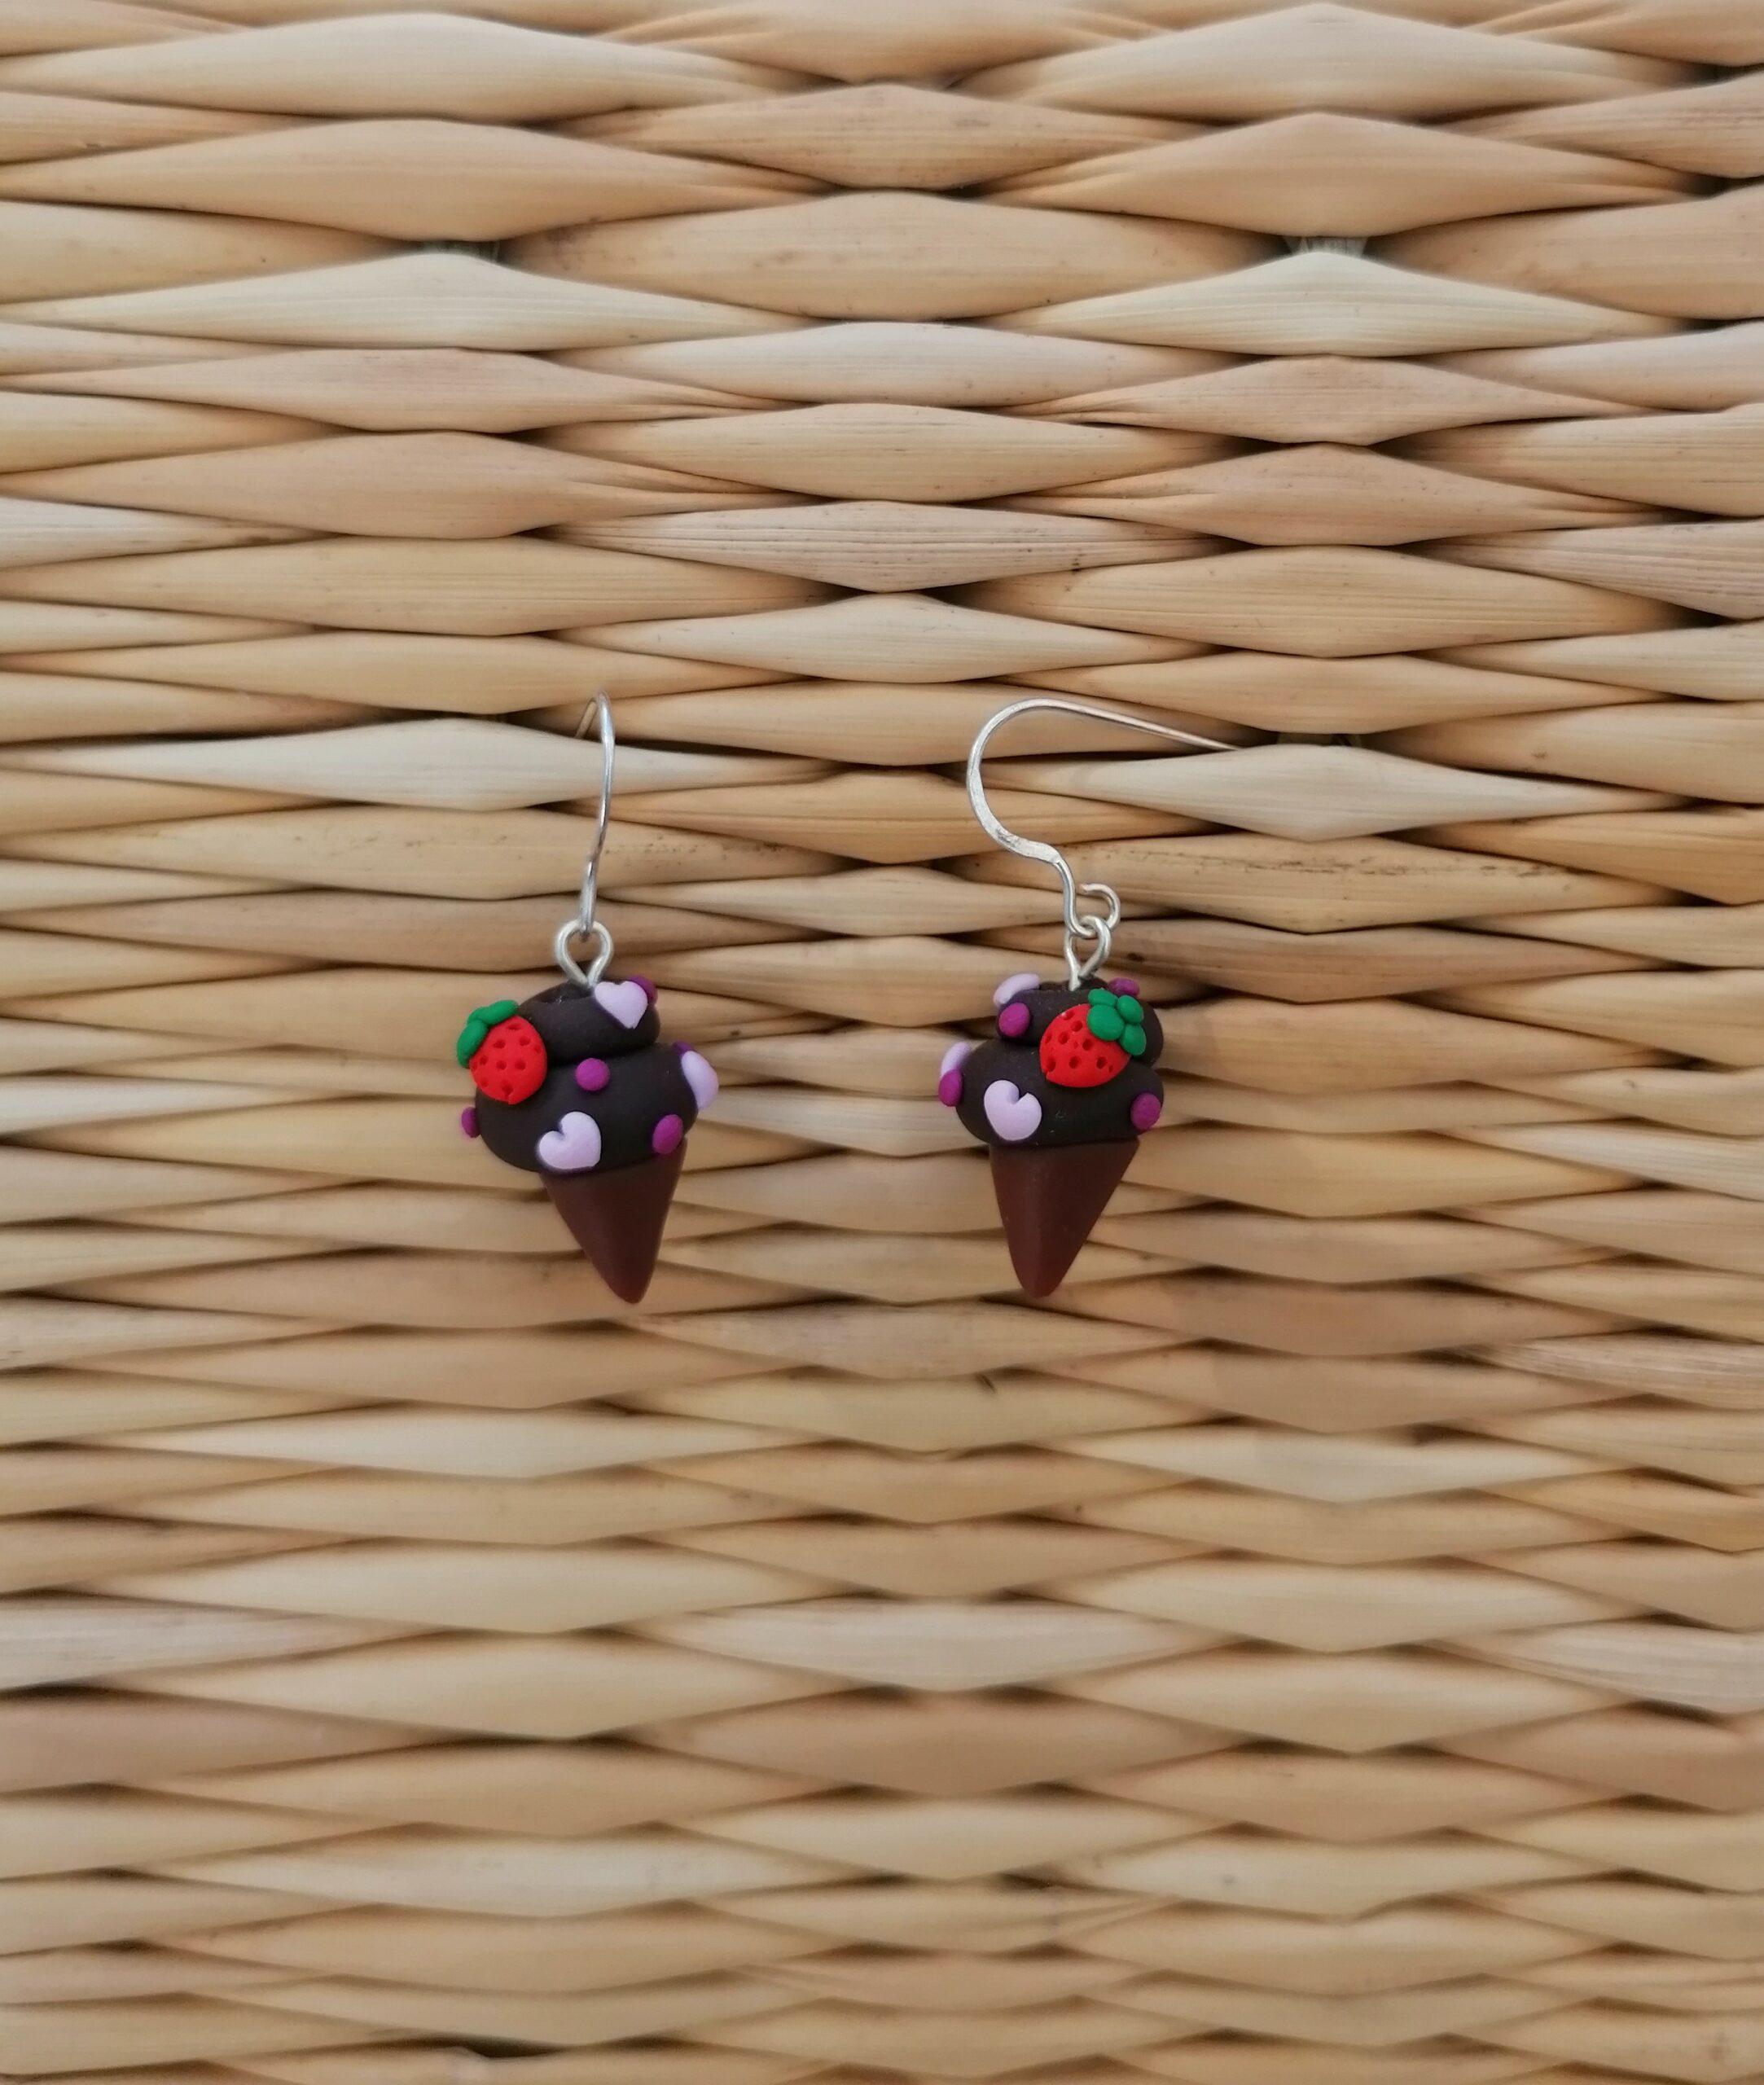 swpendearconechokostrawberries1 1 scaled